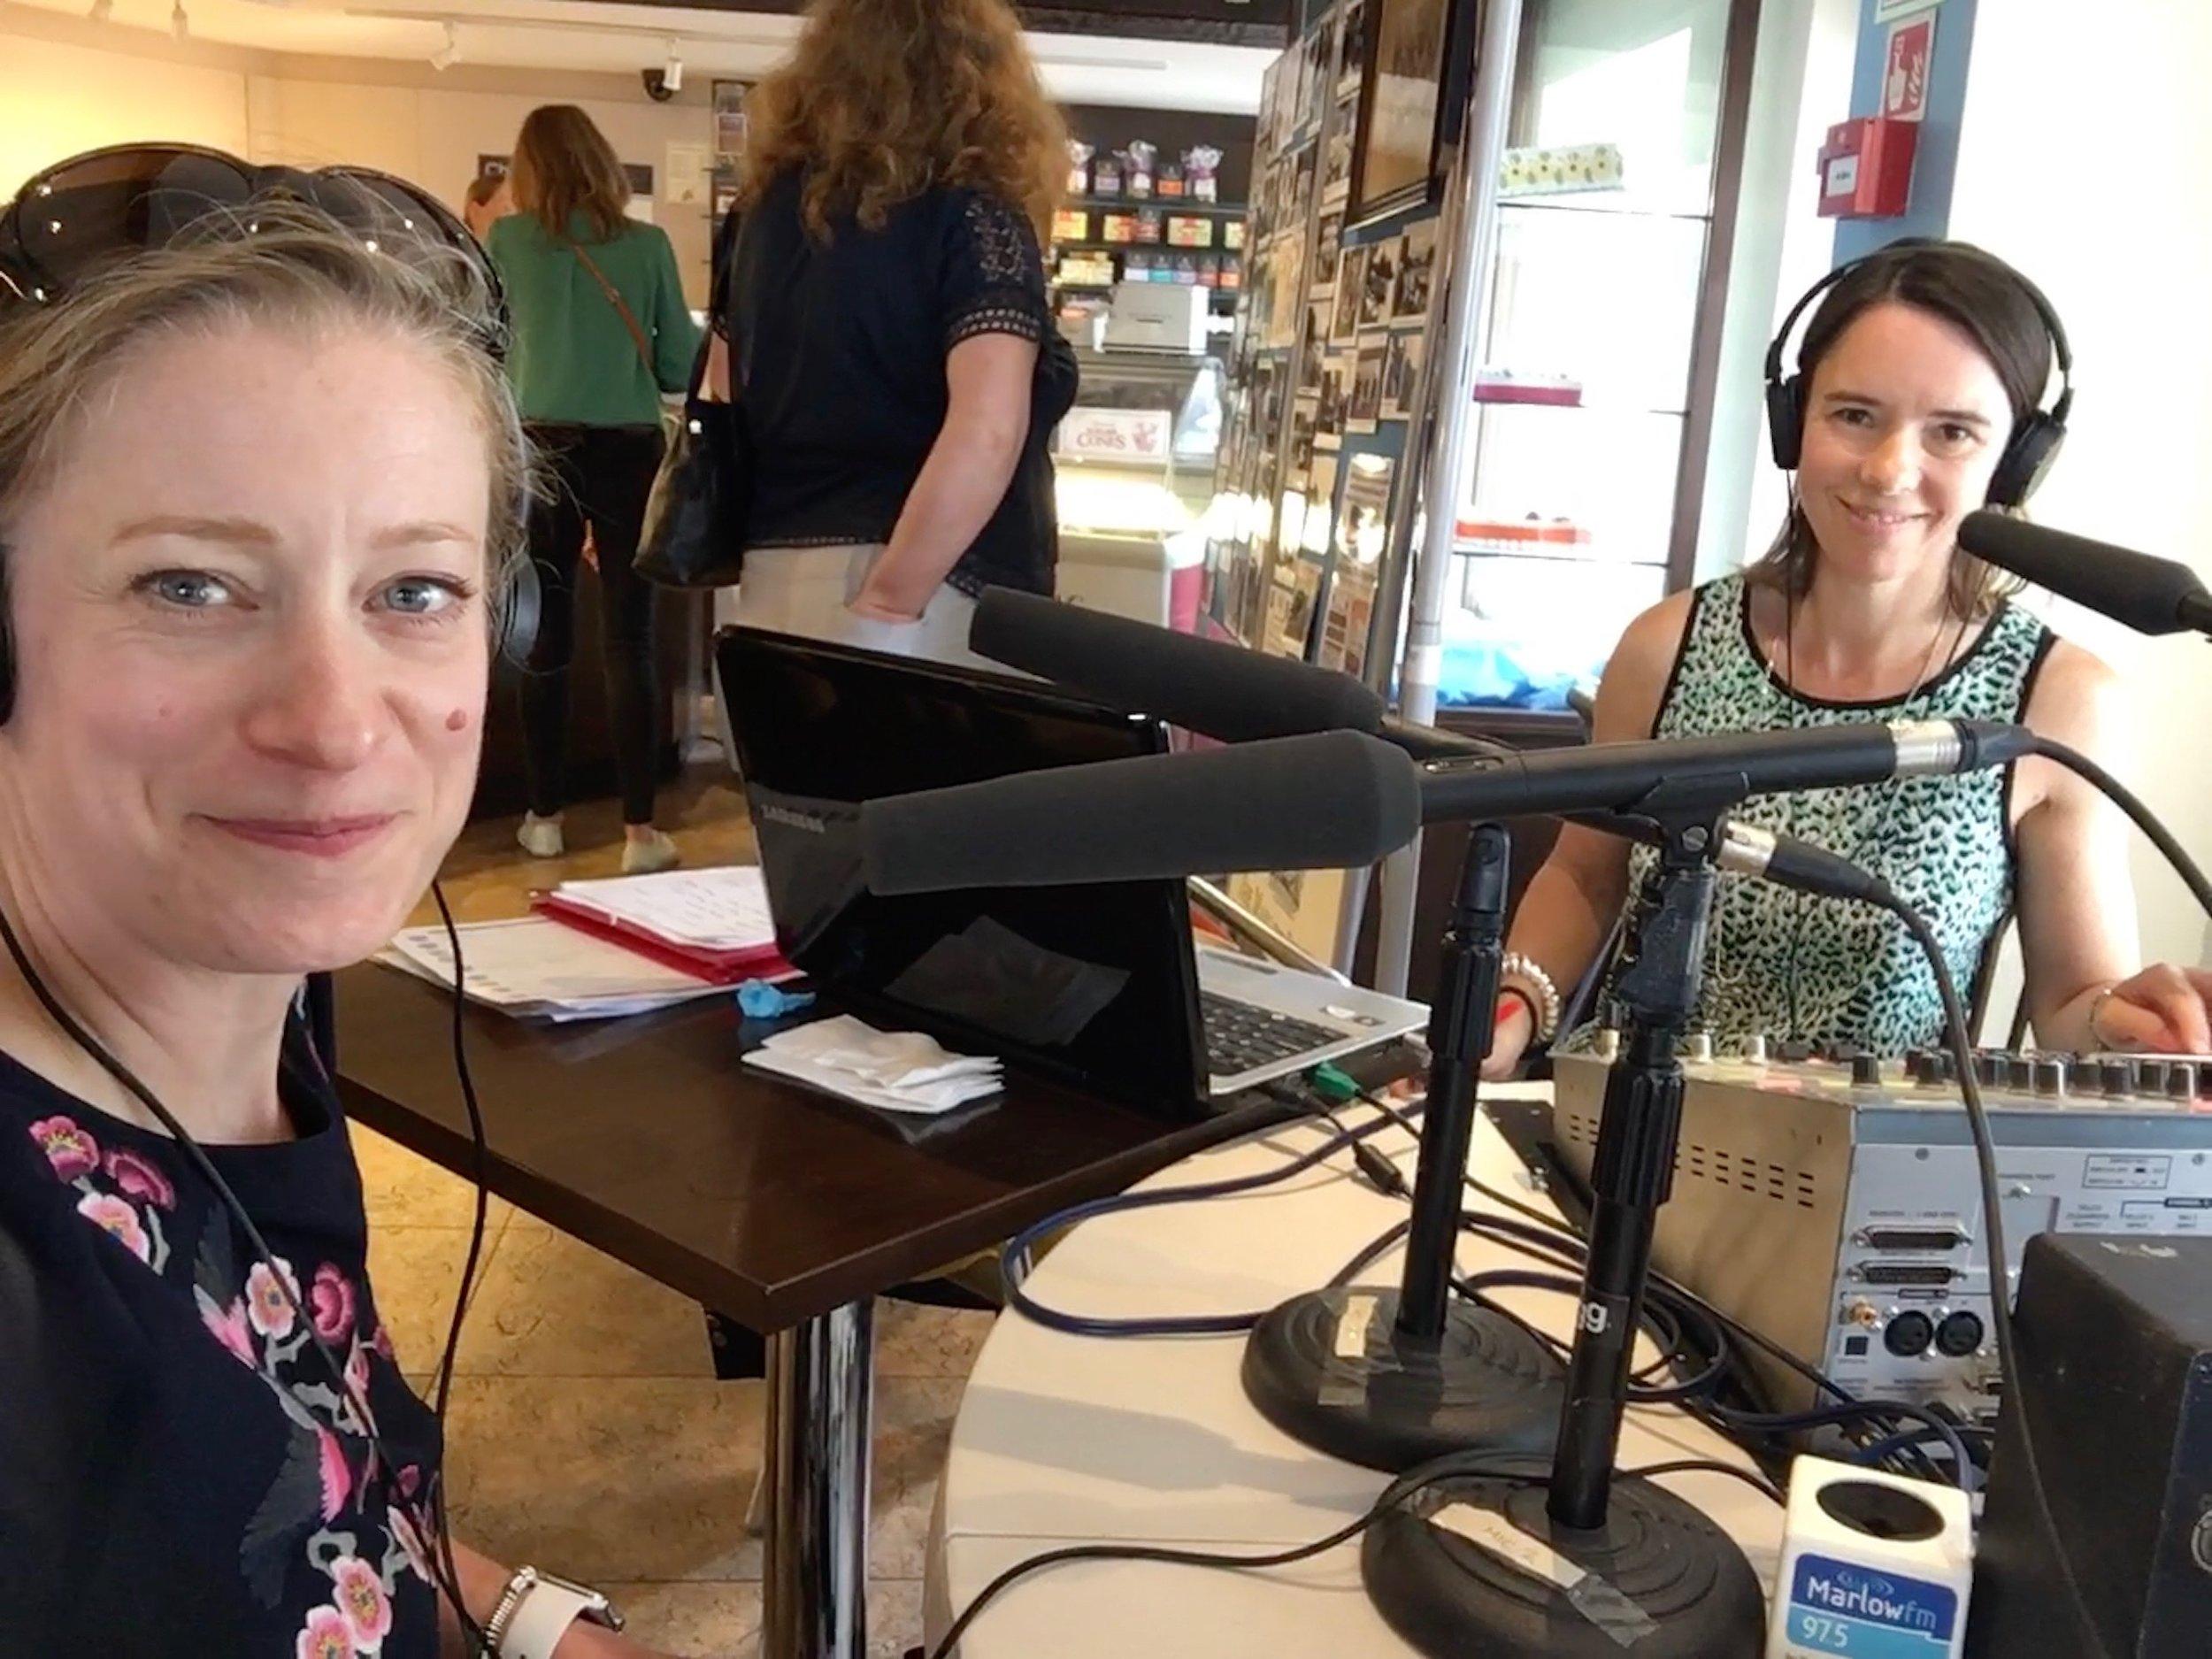 Carola Moon at MarlowFM's The Buzz - Radio Interview with Melissa Gale 4.jpg